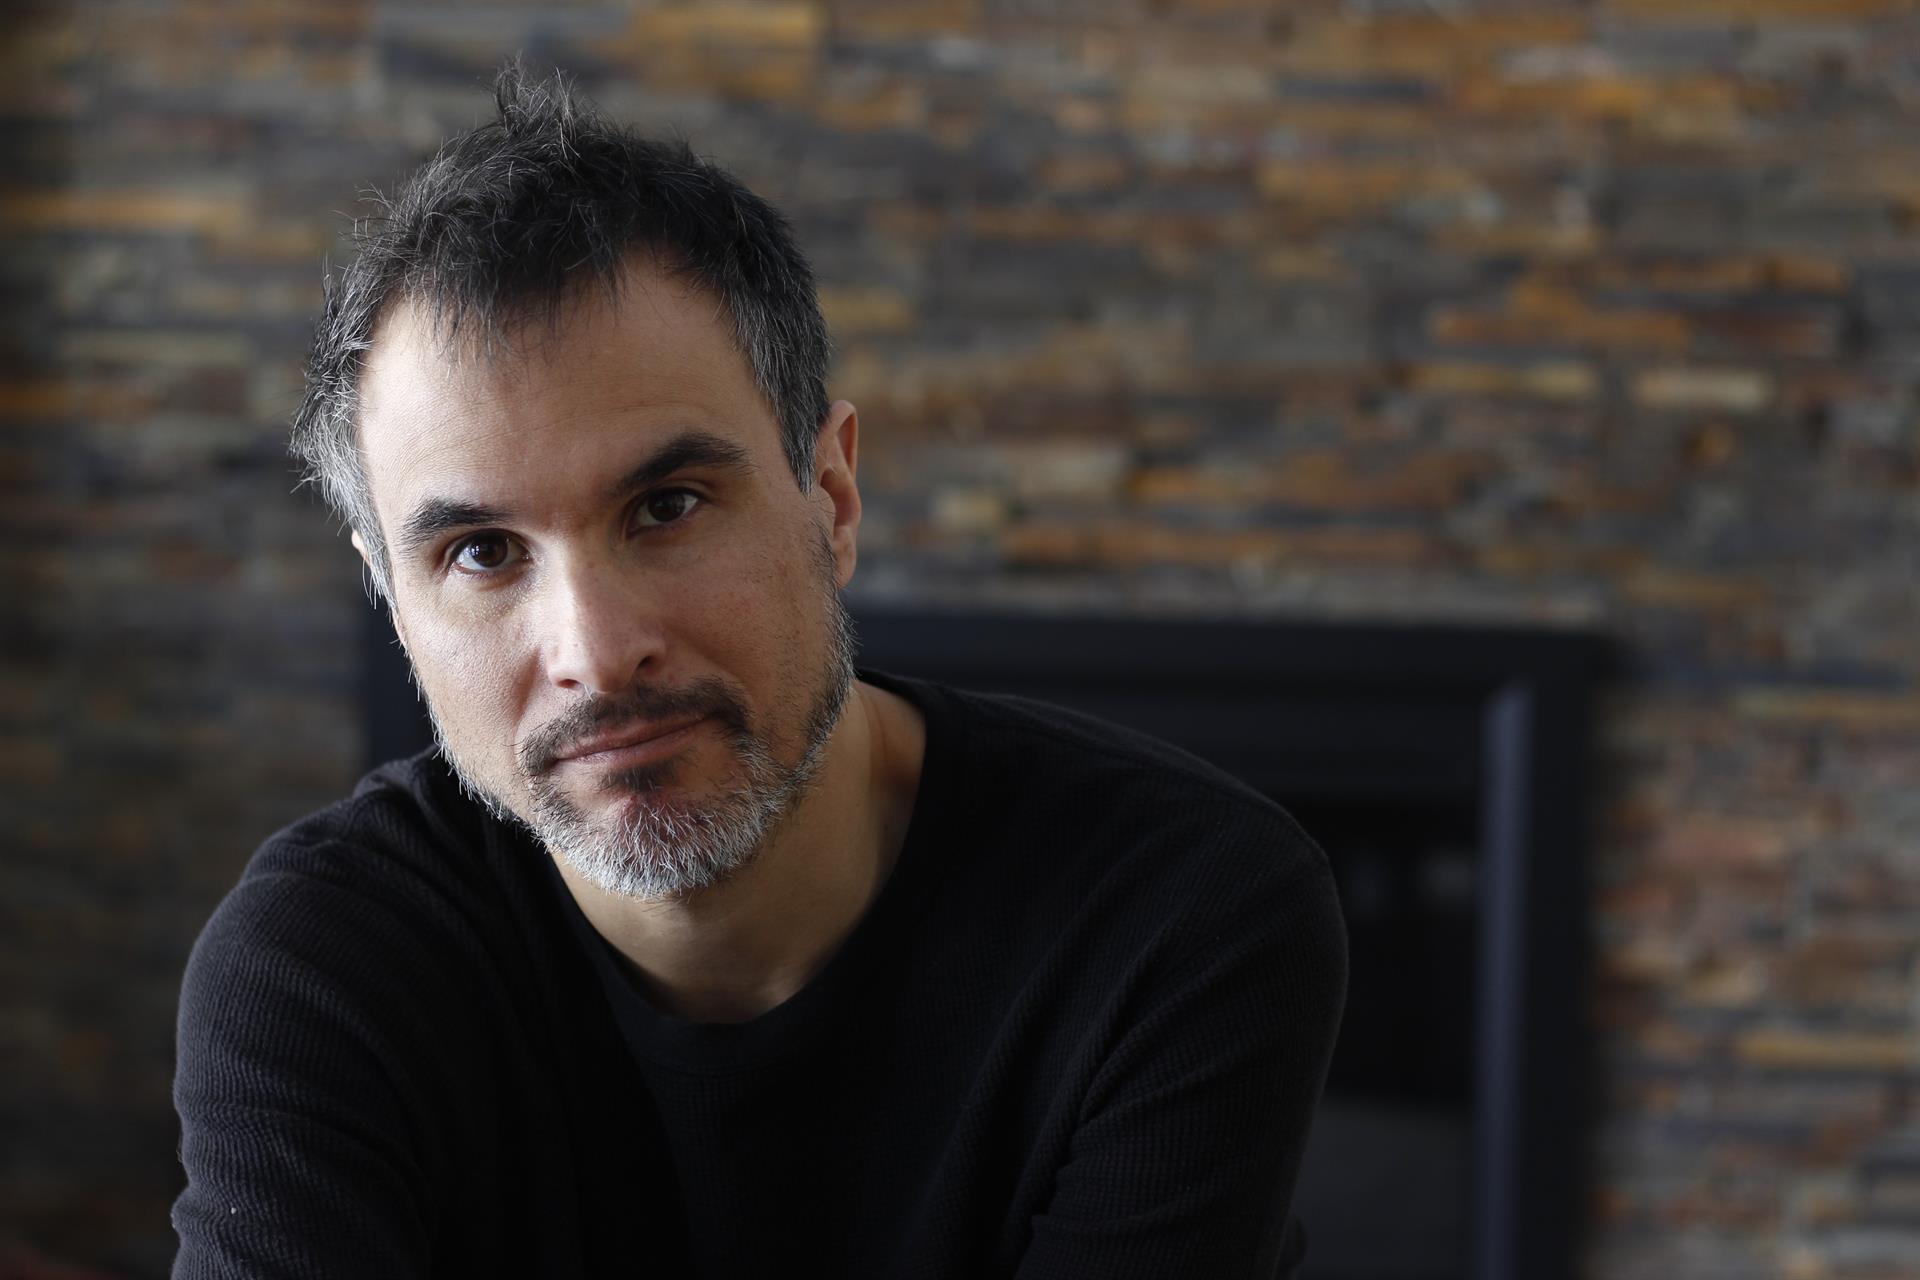 Composer Javier Farias